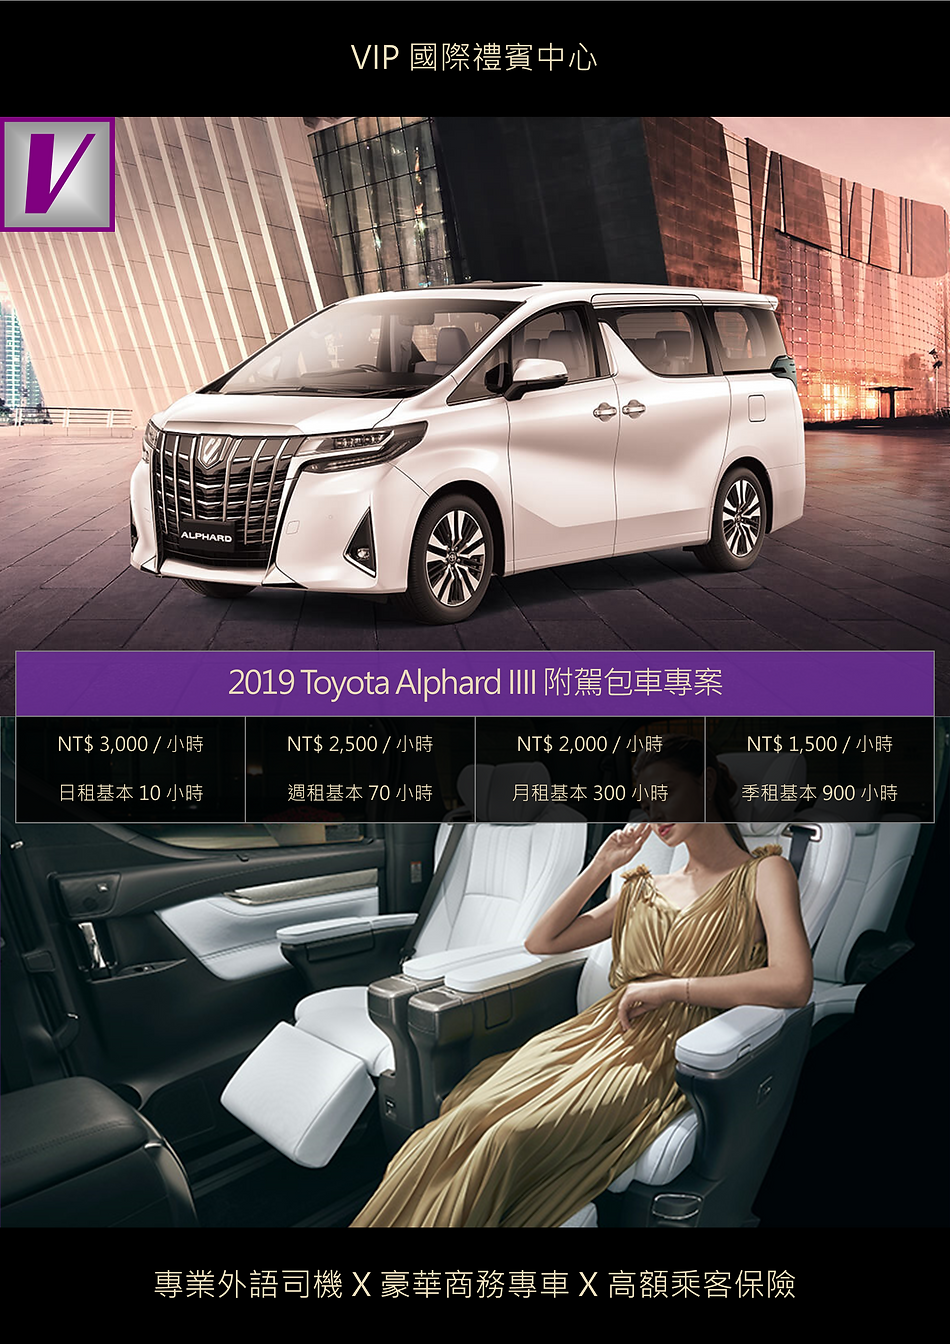 VIP國際禮賓中心 2019 TOYOTA ALPHARD IIII 附駕包車專案 DM.png